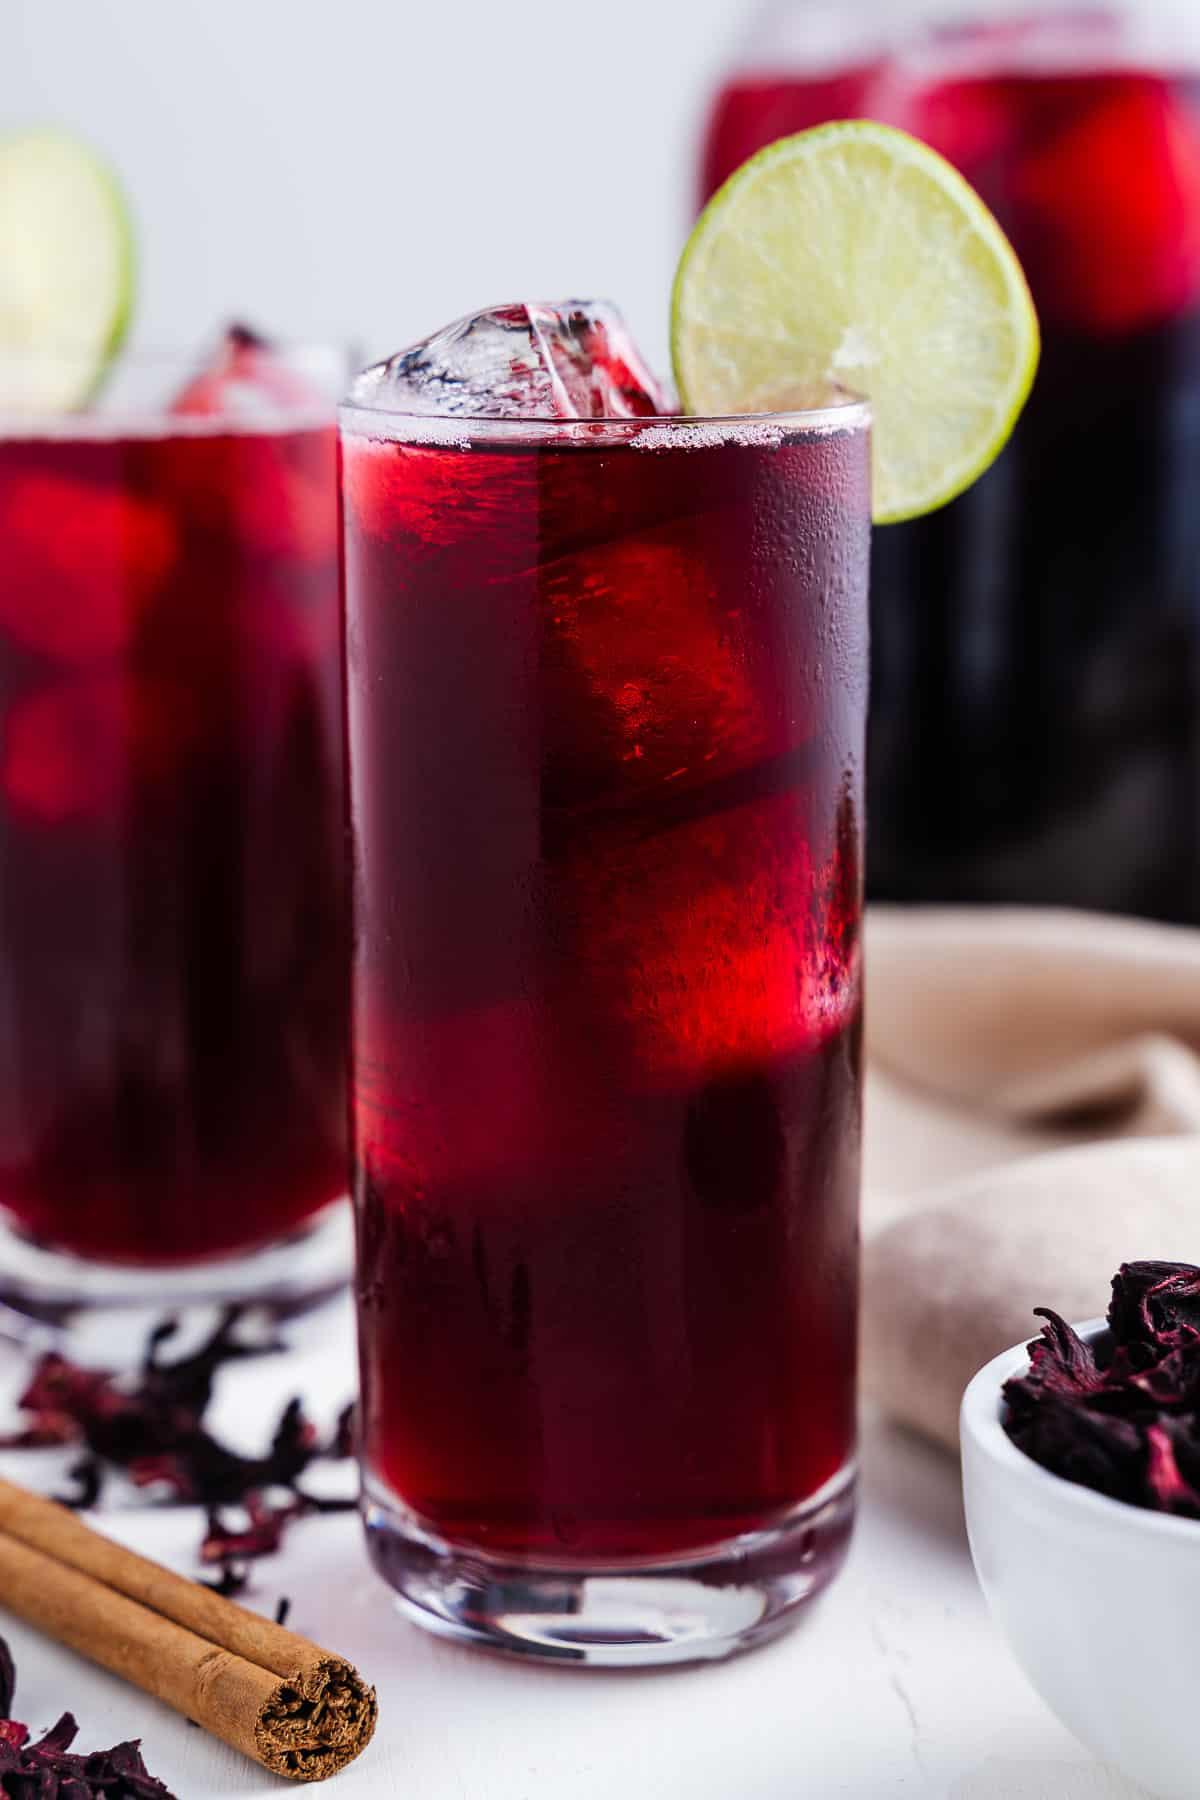 Iced Hibiscus Tea in Glasses